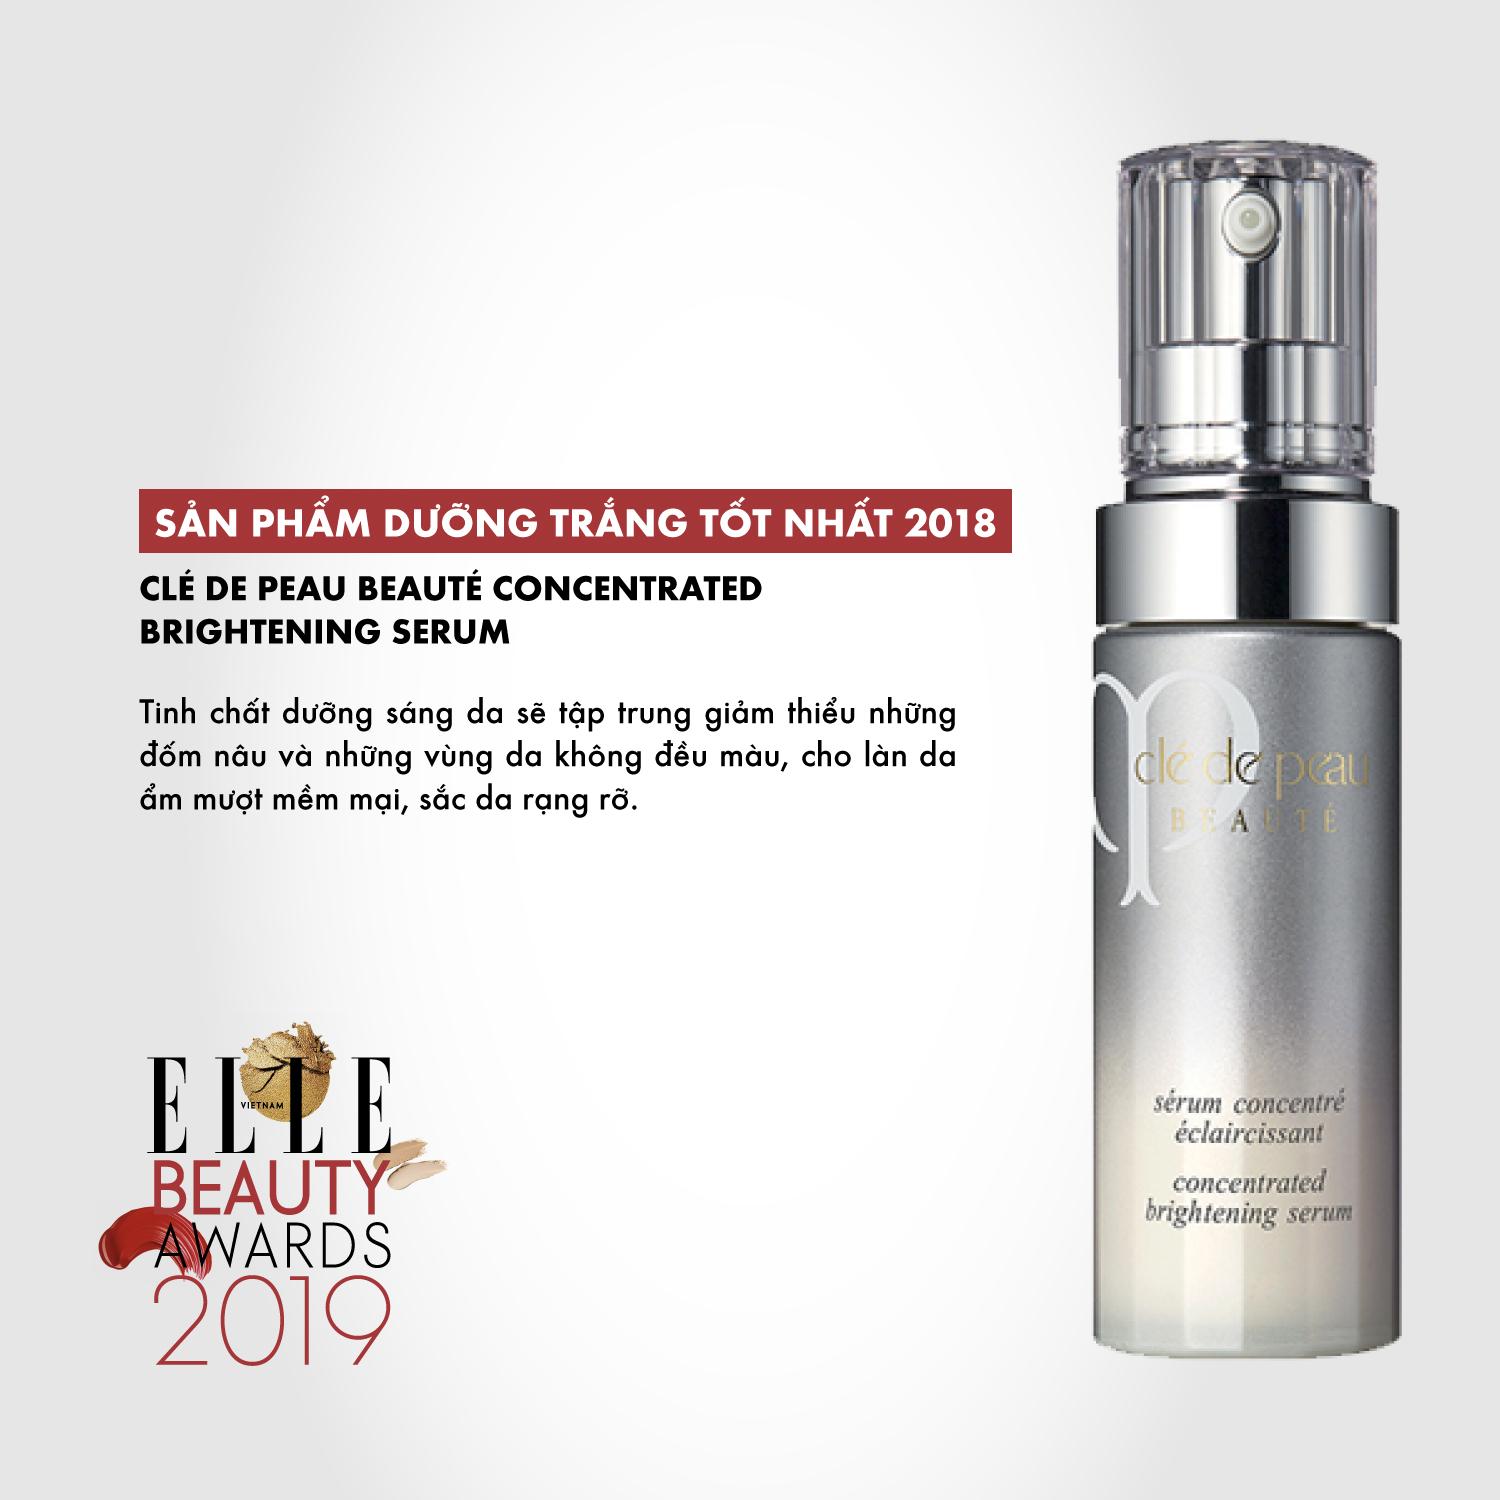 ELLE Beauty Awards 2019 dưỡng trắng 07